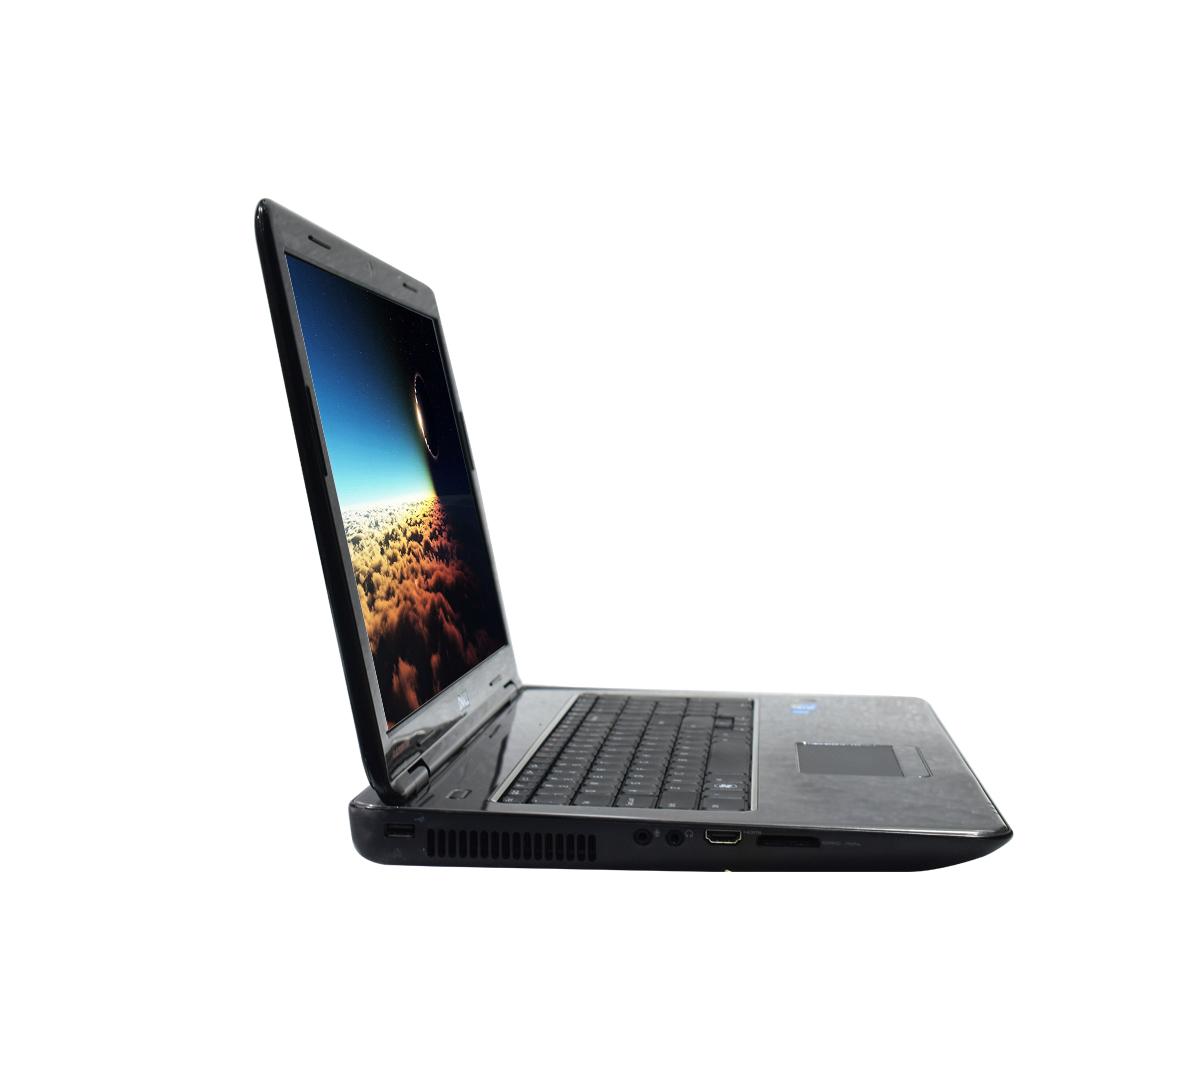 Dell Inspiron N7010 Business Laptop, Intel Core i5-M460 CPU, 4GB DDR3 SODIMM RAM, 750GB SATA 2.5 Hard, 17 inch Display (Refurbished)